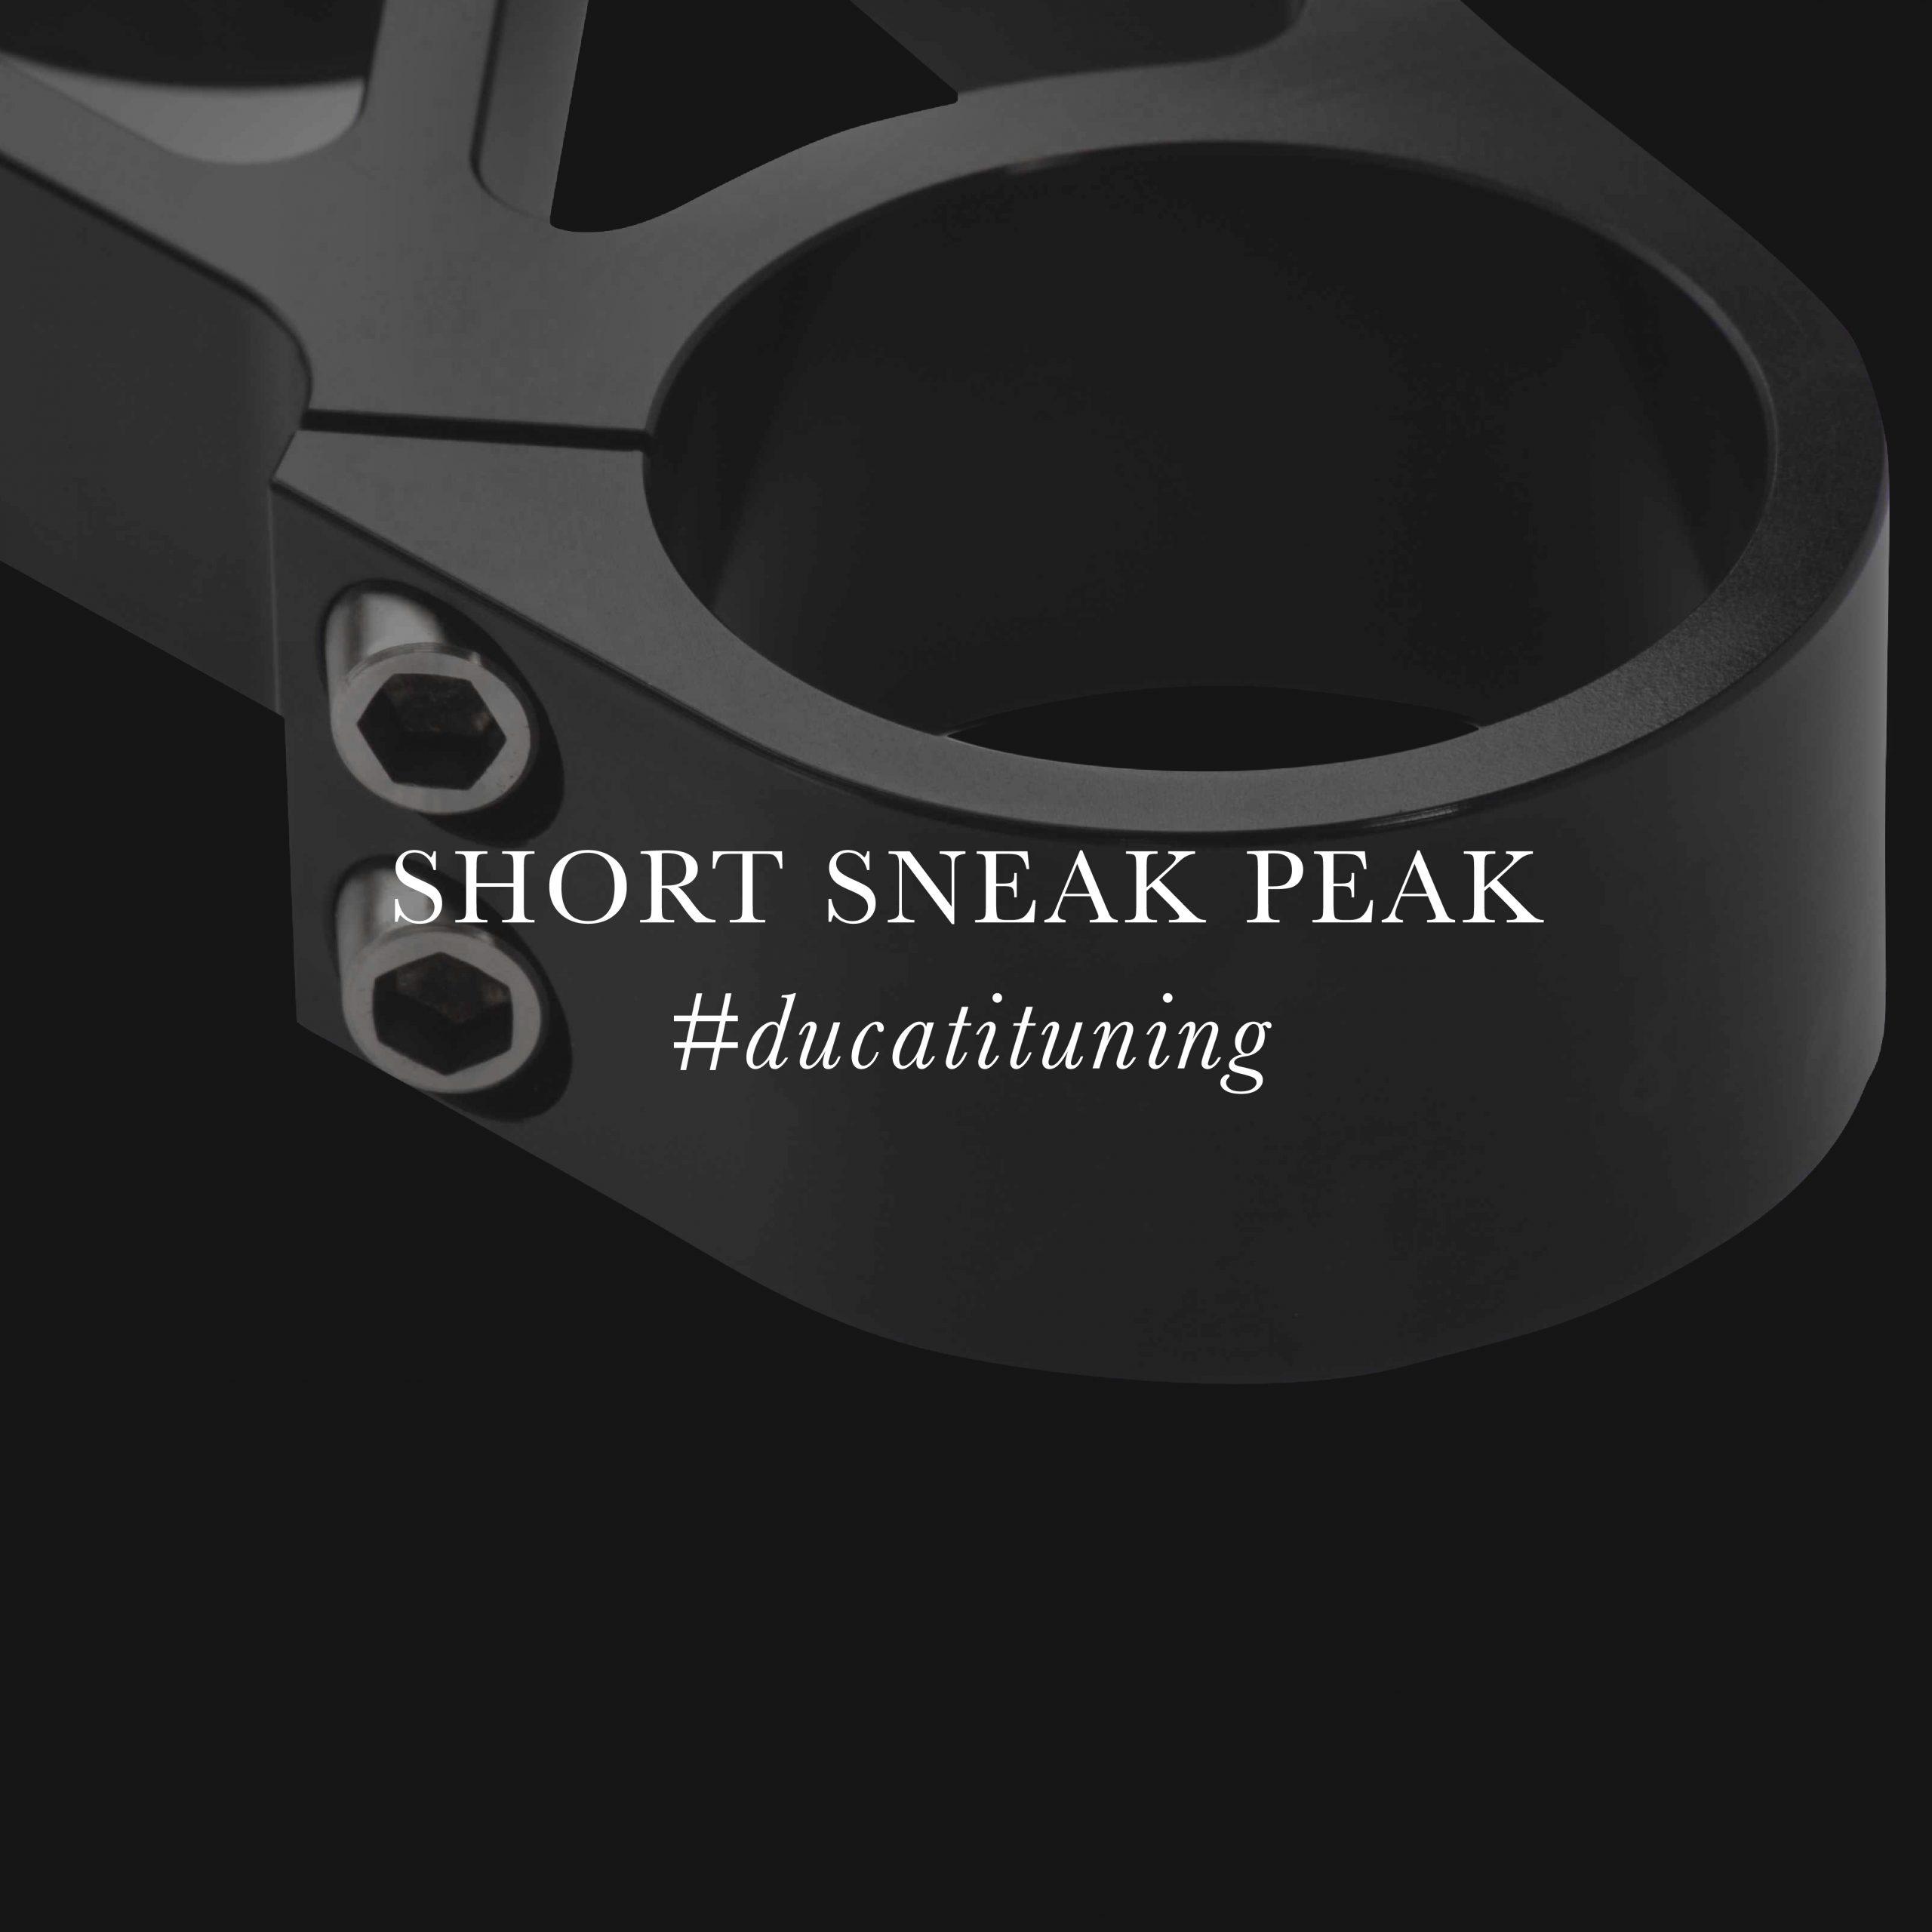 Short Sneak Peak